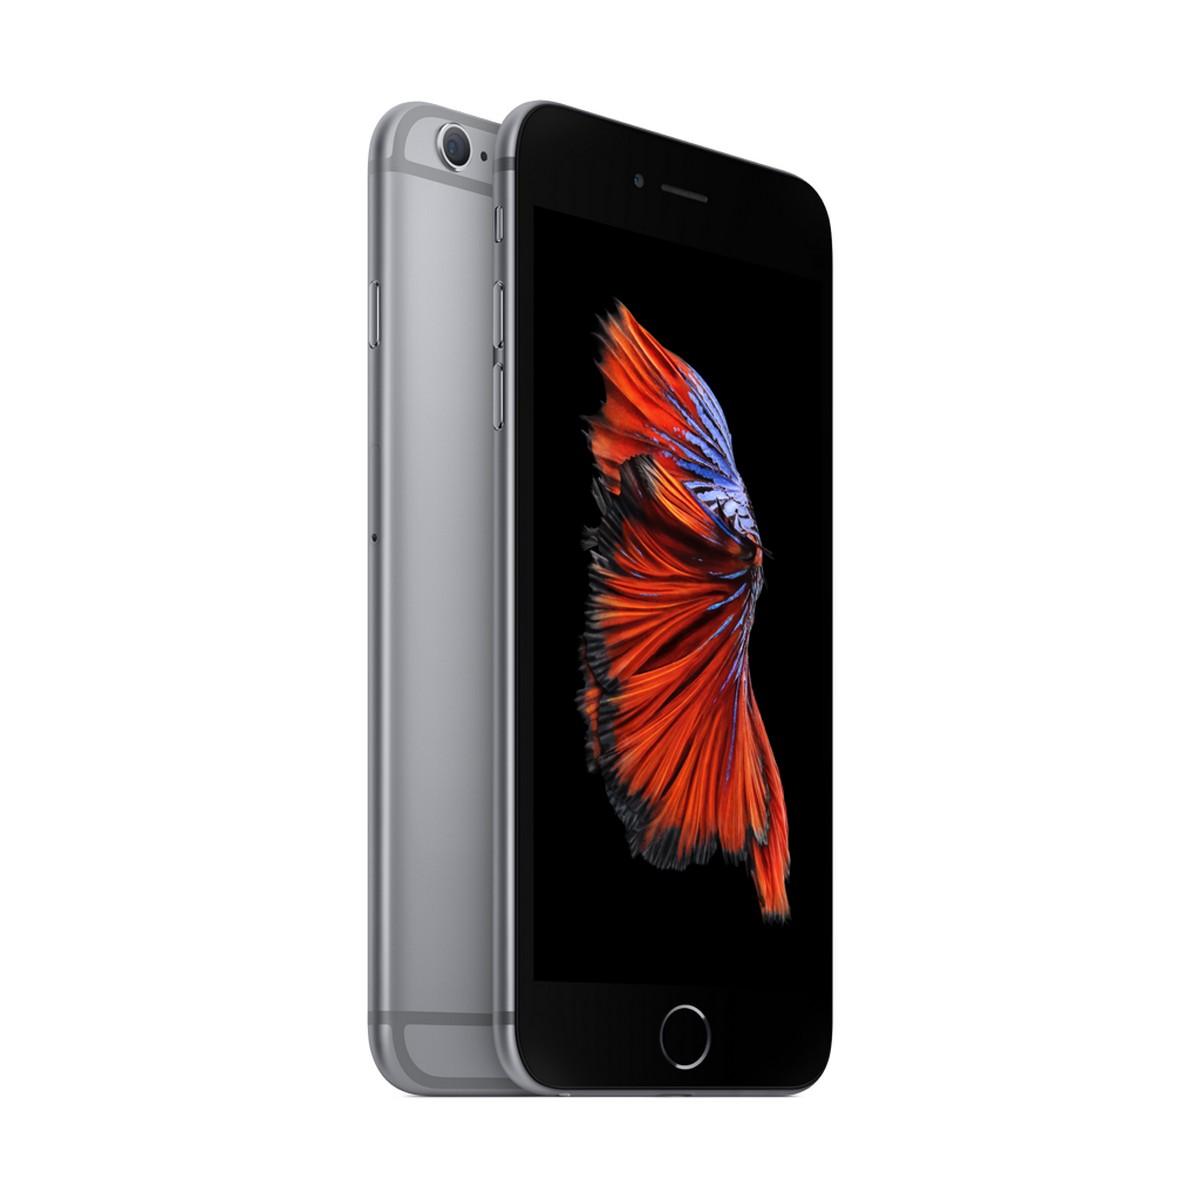 big sale 44fdd 0b334 iPhone 6s Plus (32GB, Space Grey)